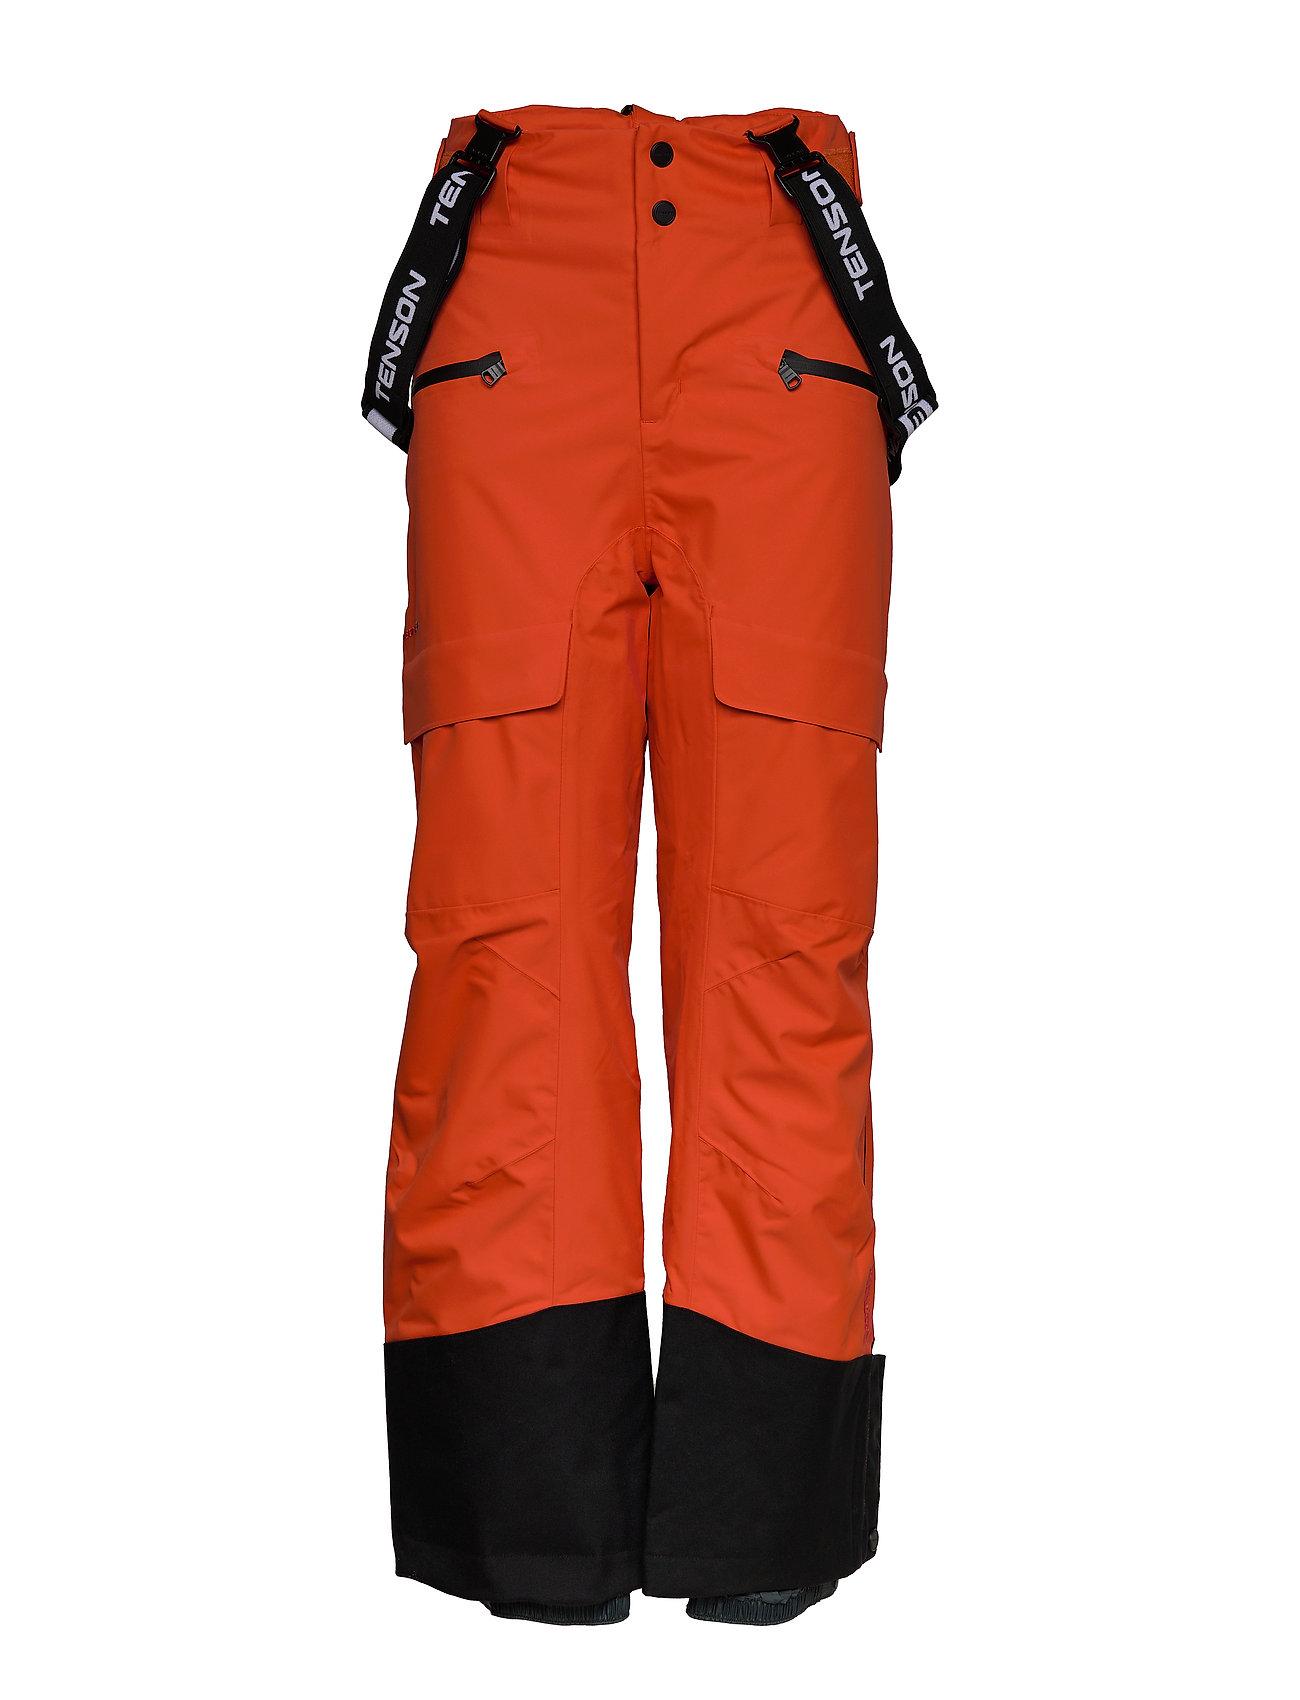 Image of Salome Sport Pants Orange Tenson (3266926921)